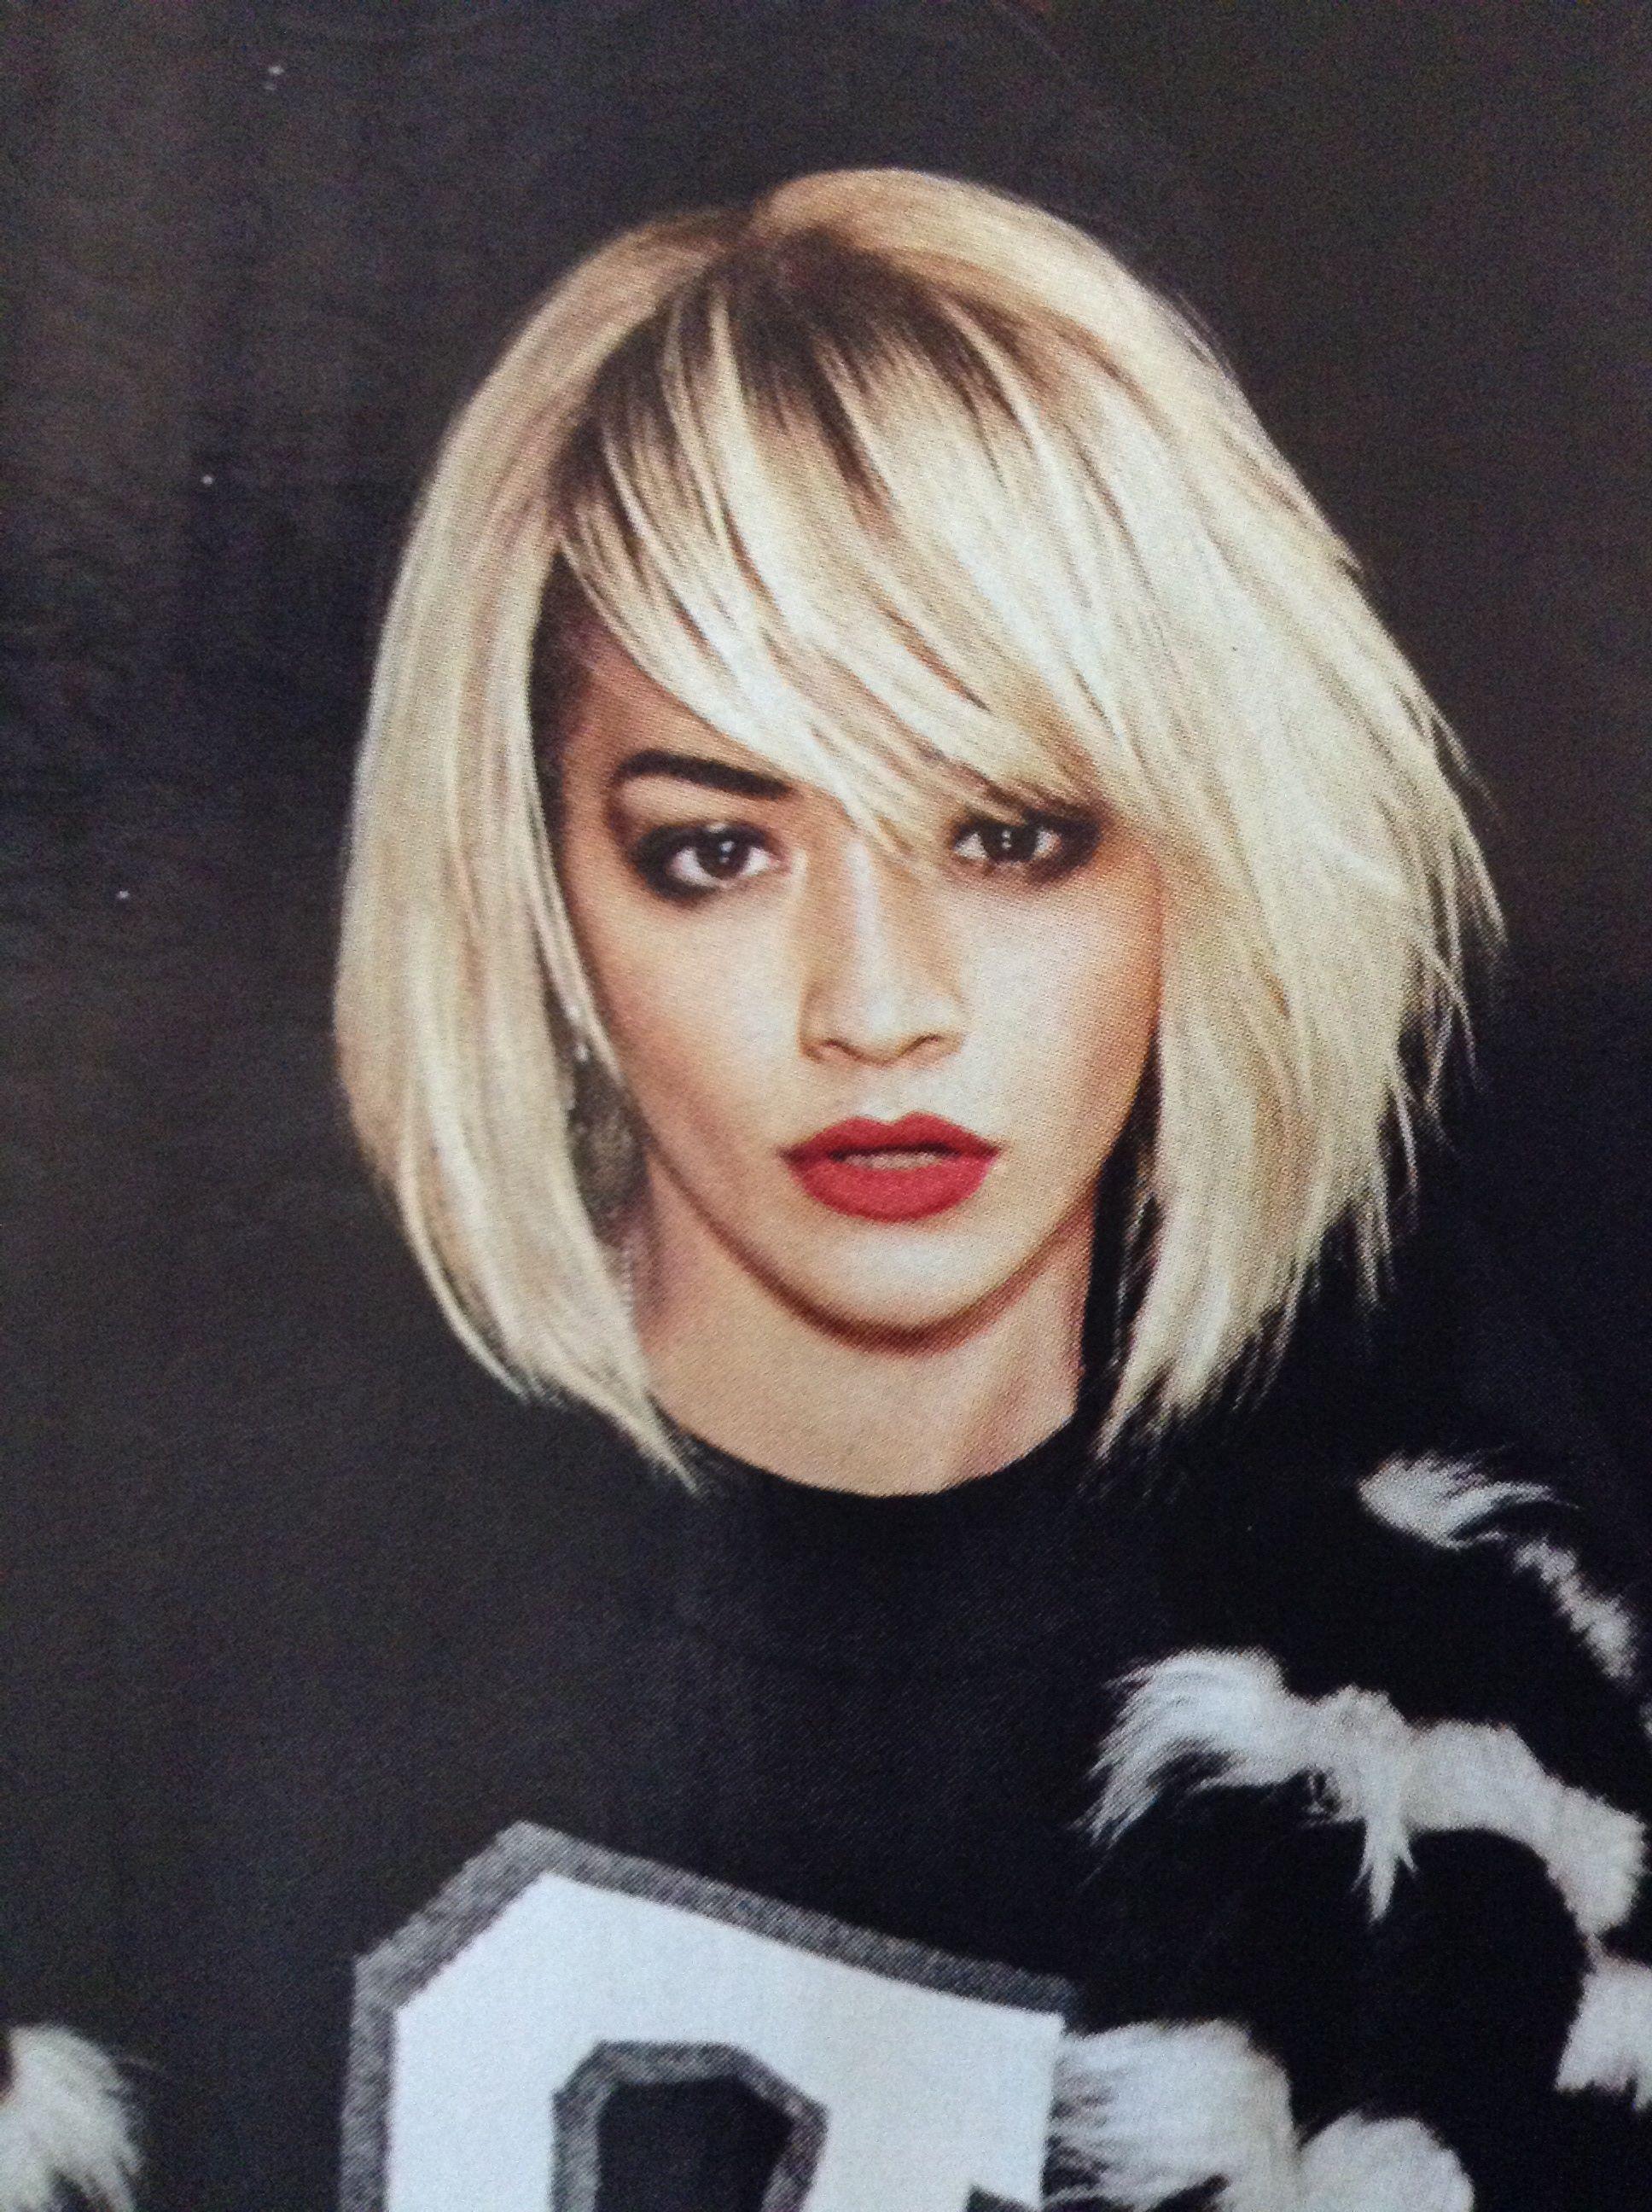 Rita Ora. Hair And Makeup Perfection (View 5 of 25)